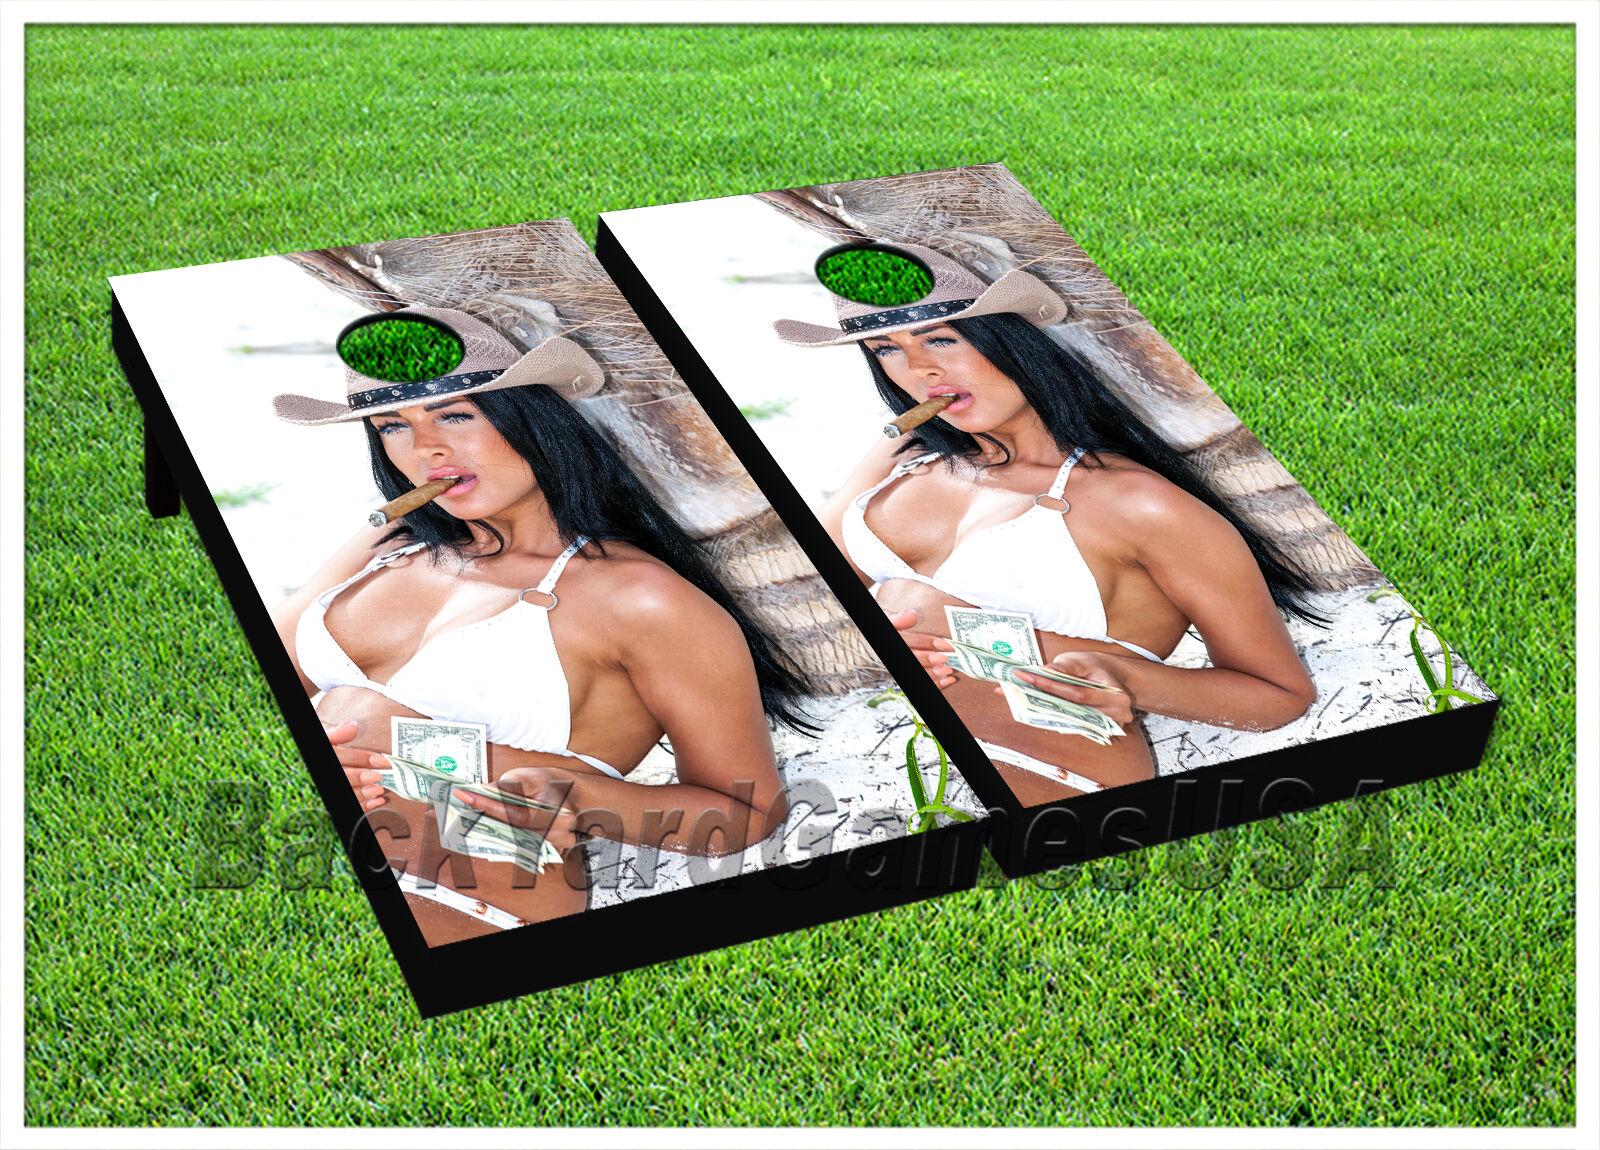 CORNHOLE BEANTasche TOSS GAME American Cowgirl Weiß w Tasches Game Boards Set 1063